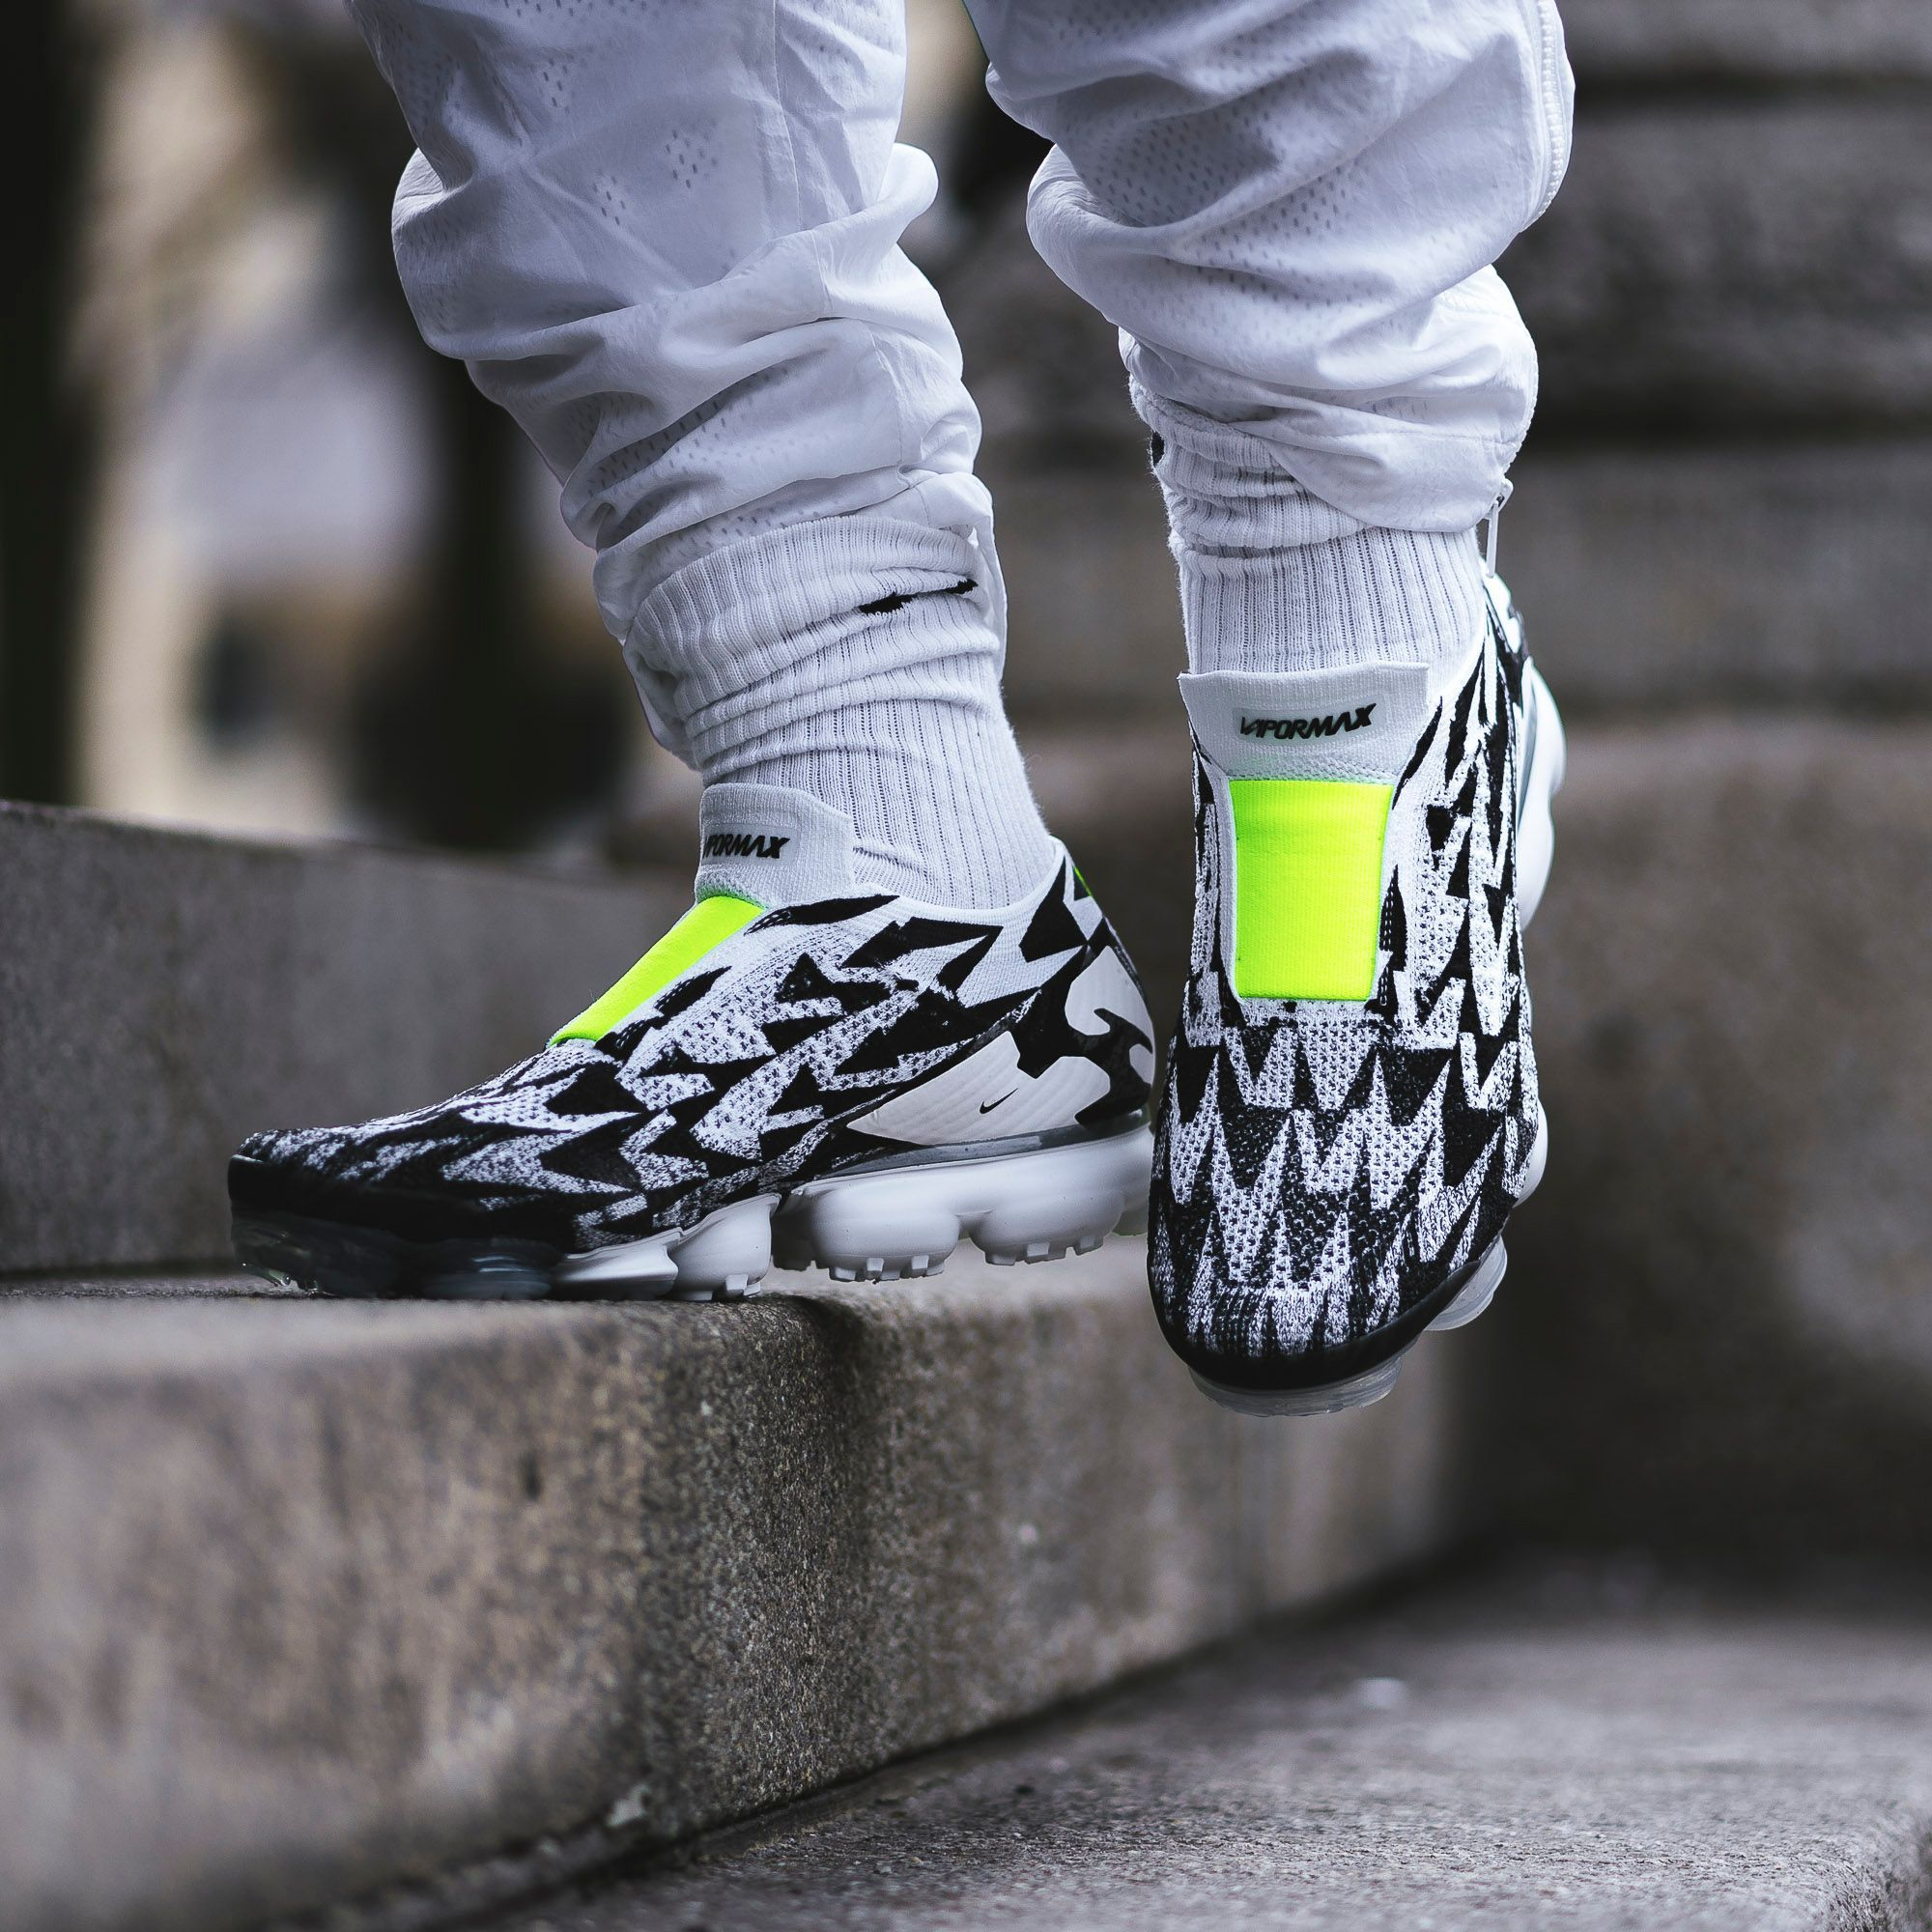 separation shoes af864 46d23 ACRONYM x Nike Air VaporMax Moc 2 Black White  AQ0996-001  The Sole  Supplier